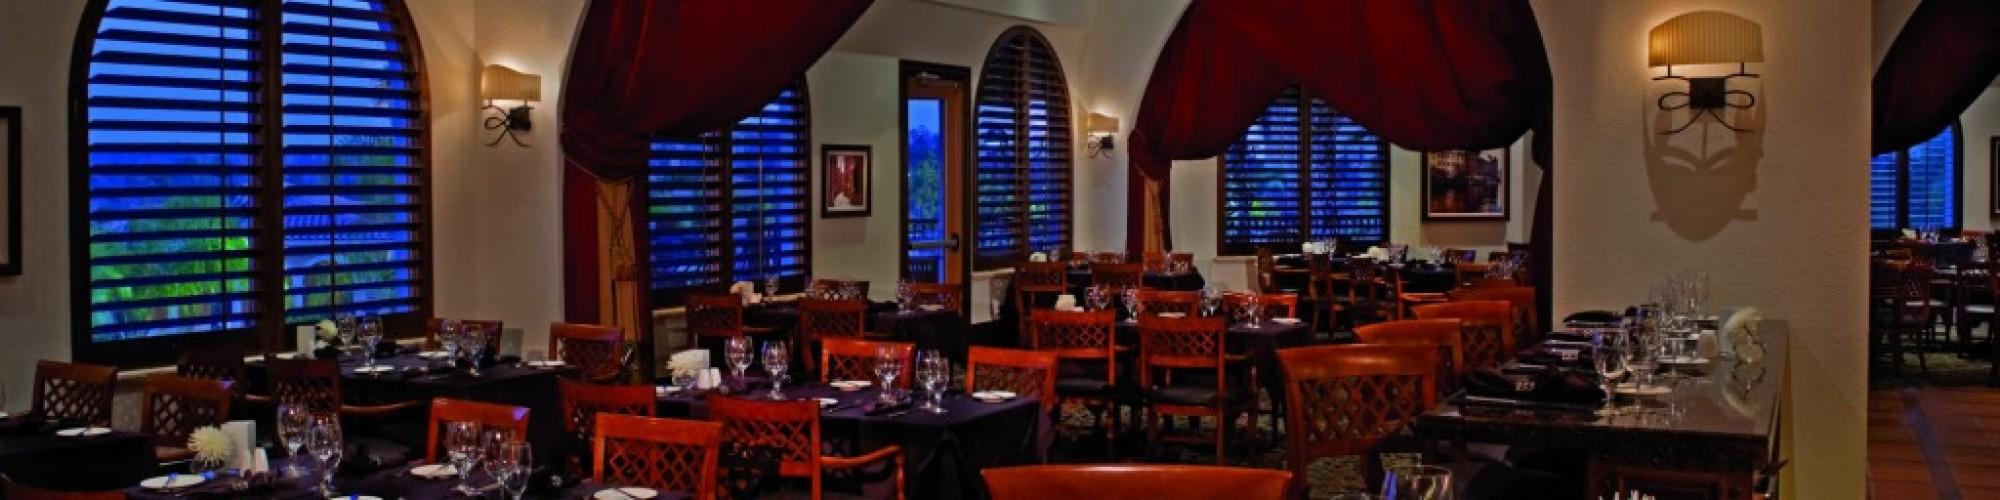 Cala Bella Restaurant Slider Image 4